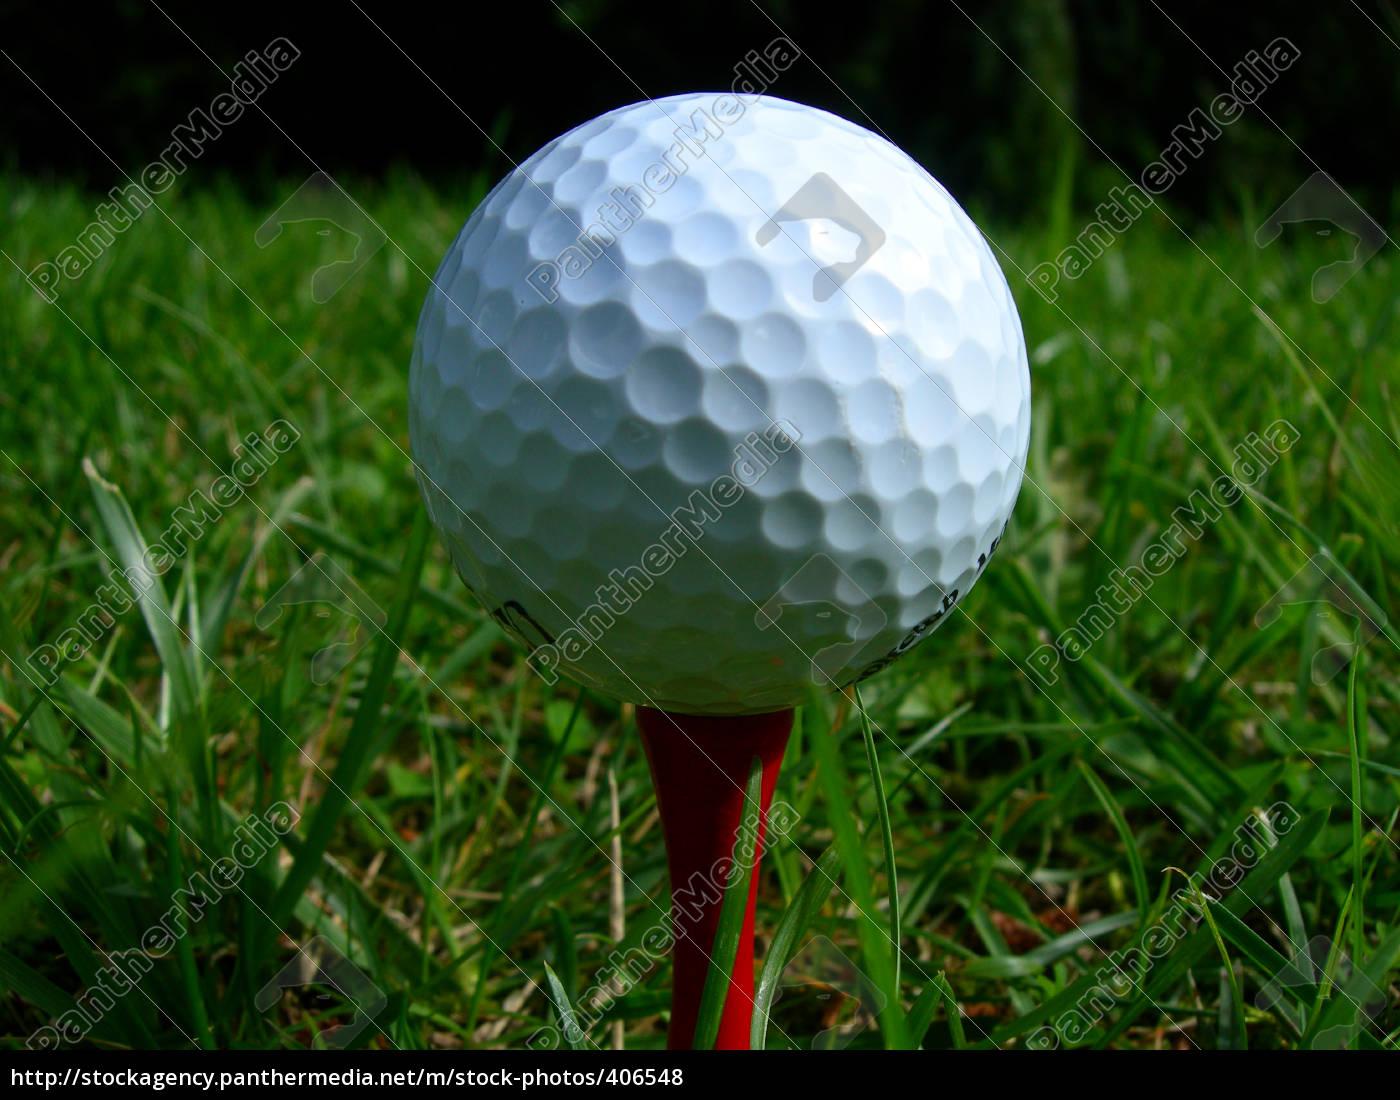 golf - 406548